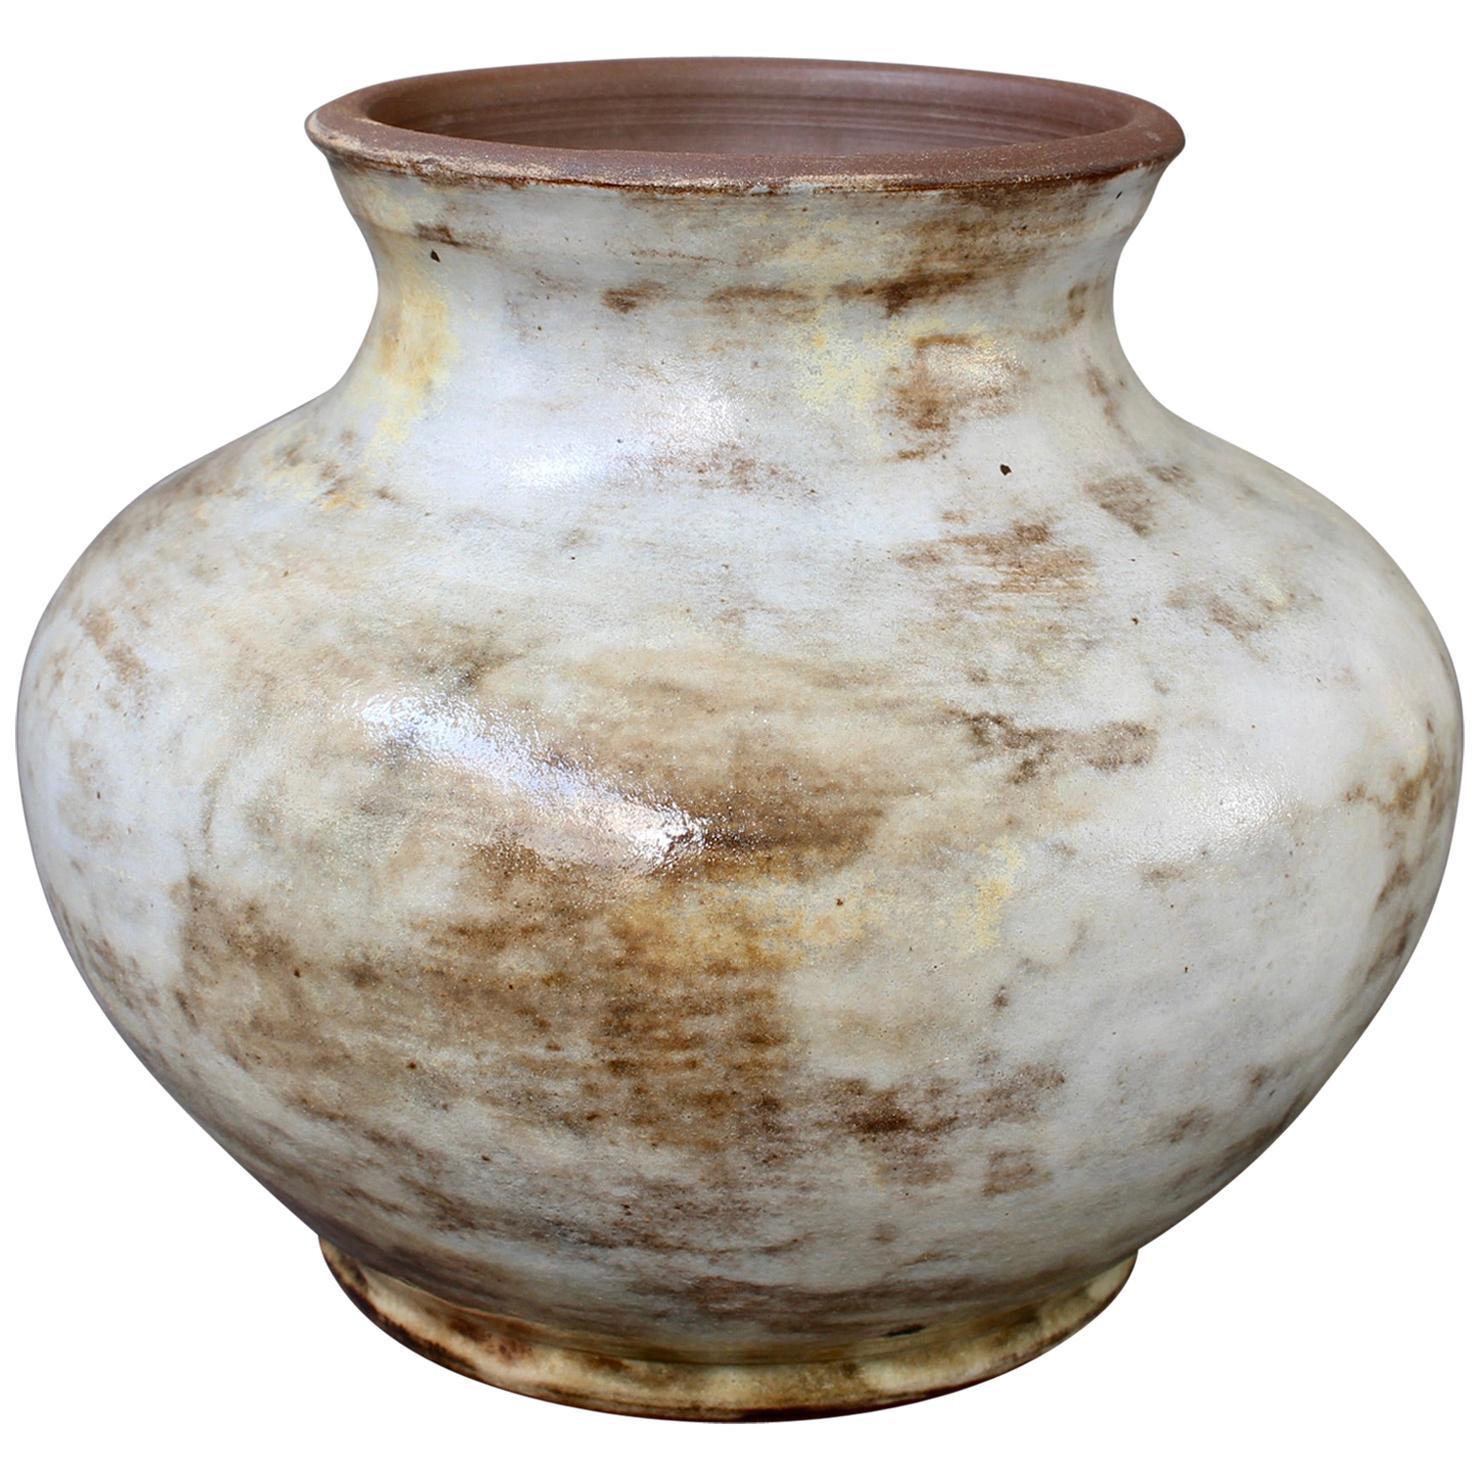 Vintage French Ceramic Vase by Alexandre Kostanda 'circa 1960s'